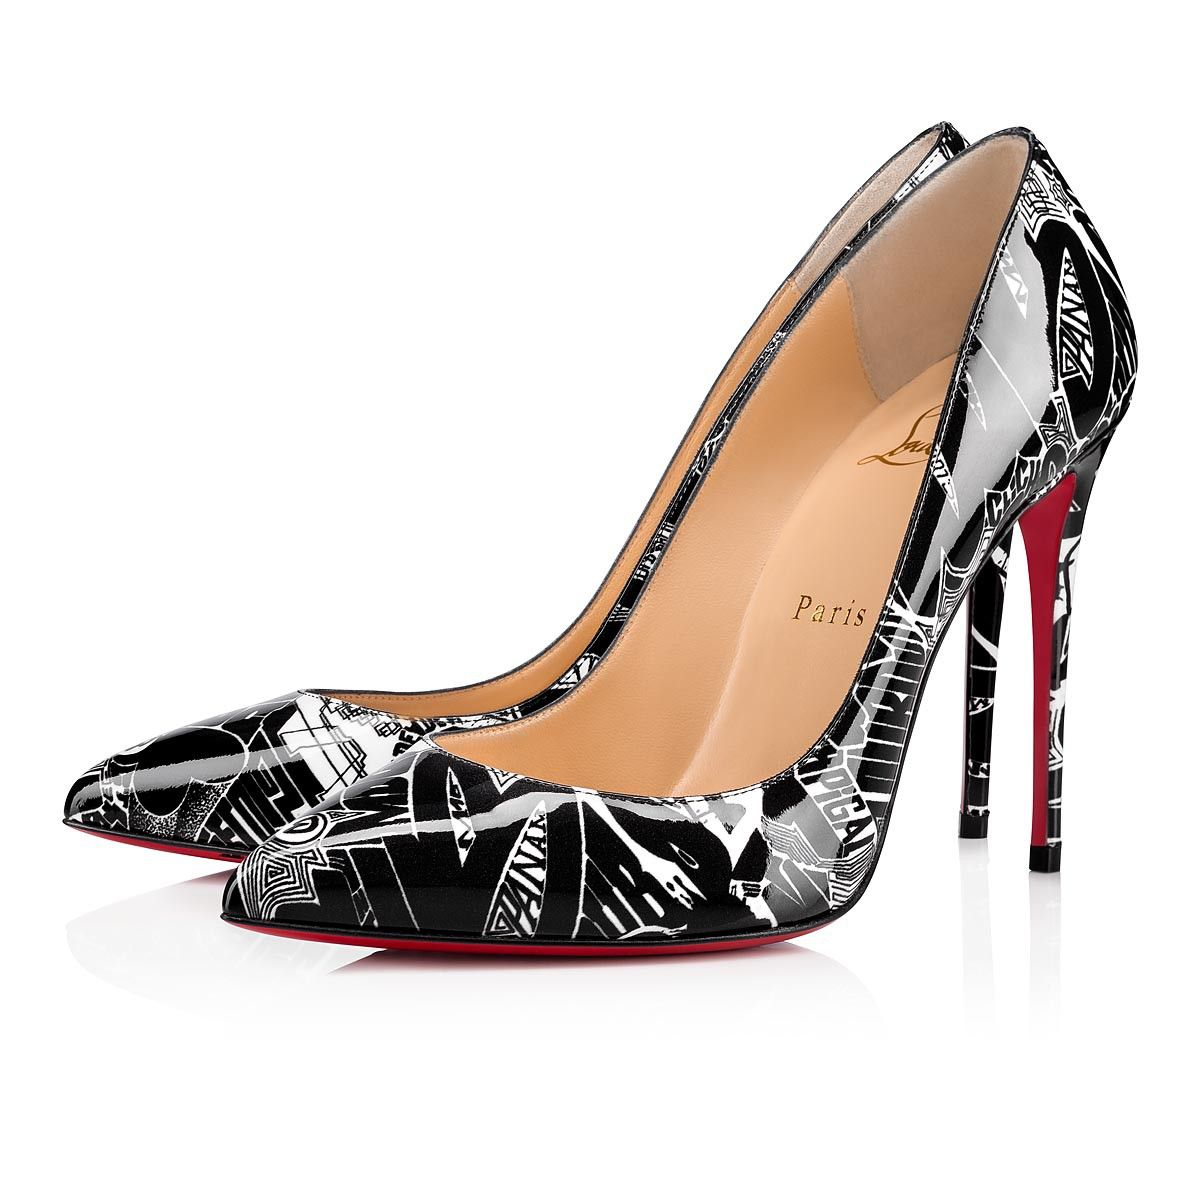 Christian Louboutin Spitz Pumps schwarz rot Elegant